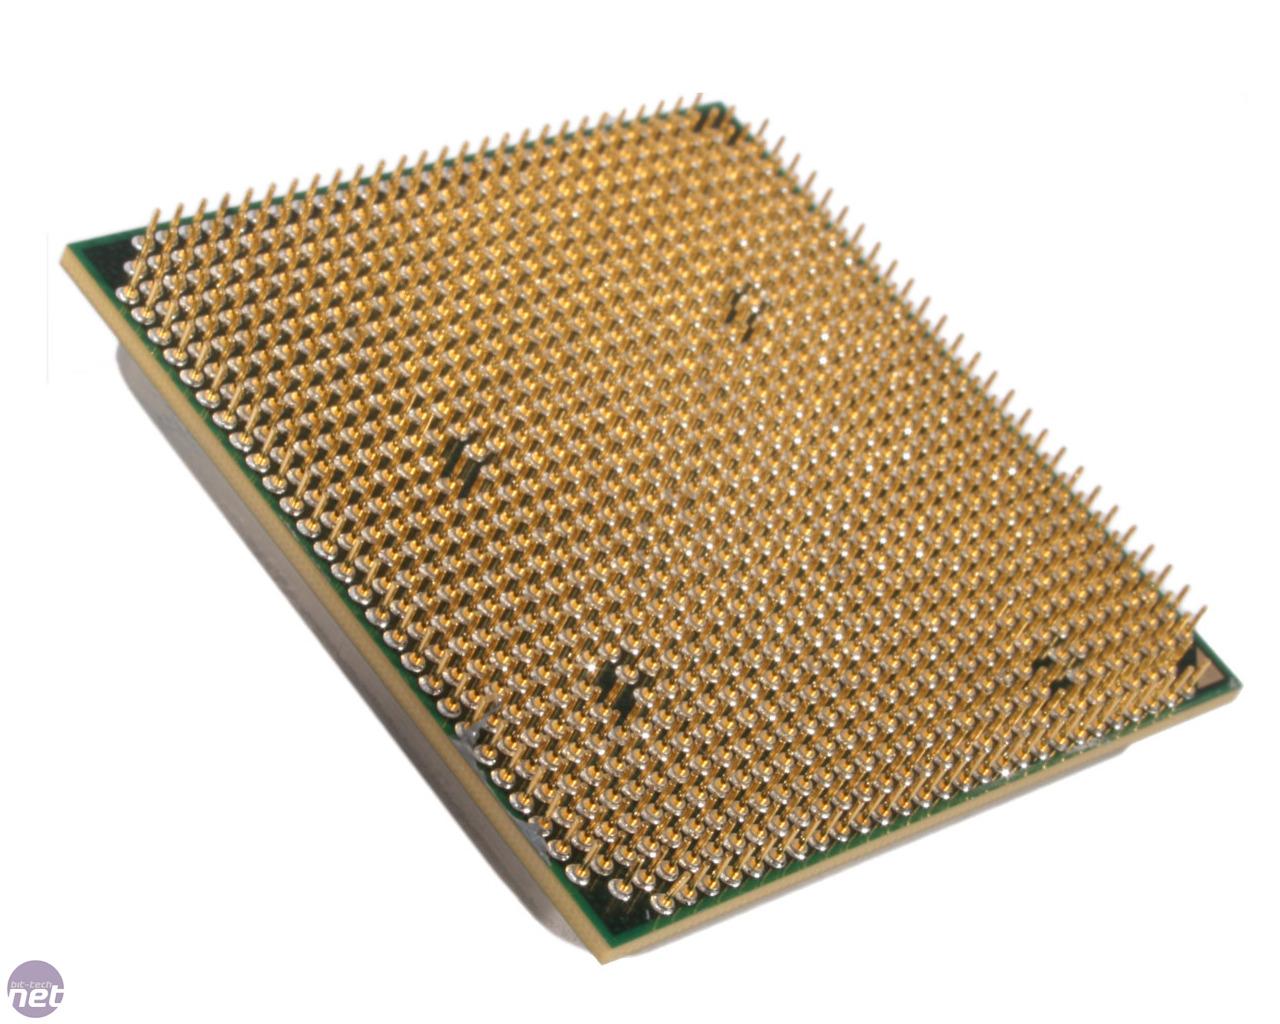 Reflections of Rodney: My New Desktop PC - The Processor